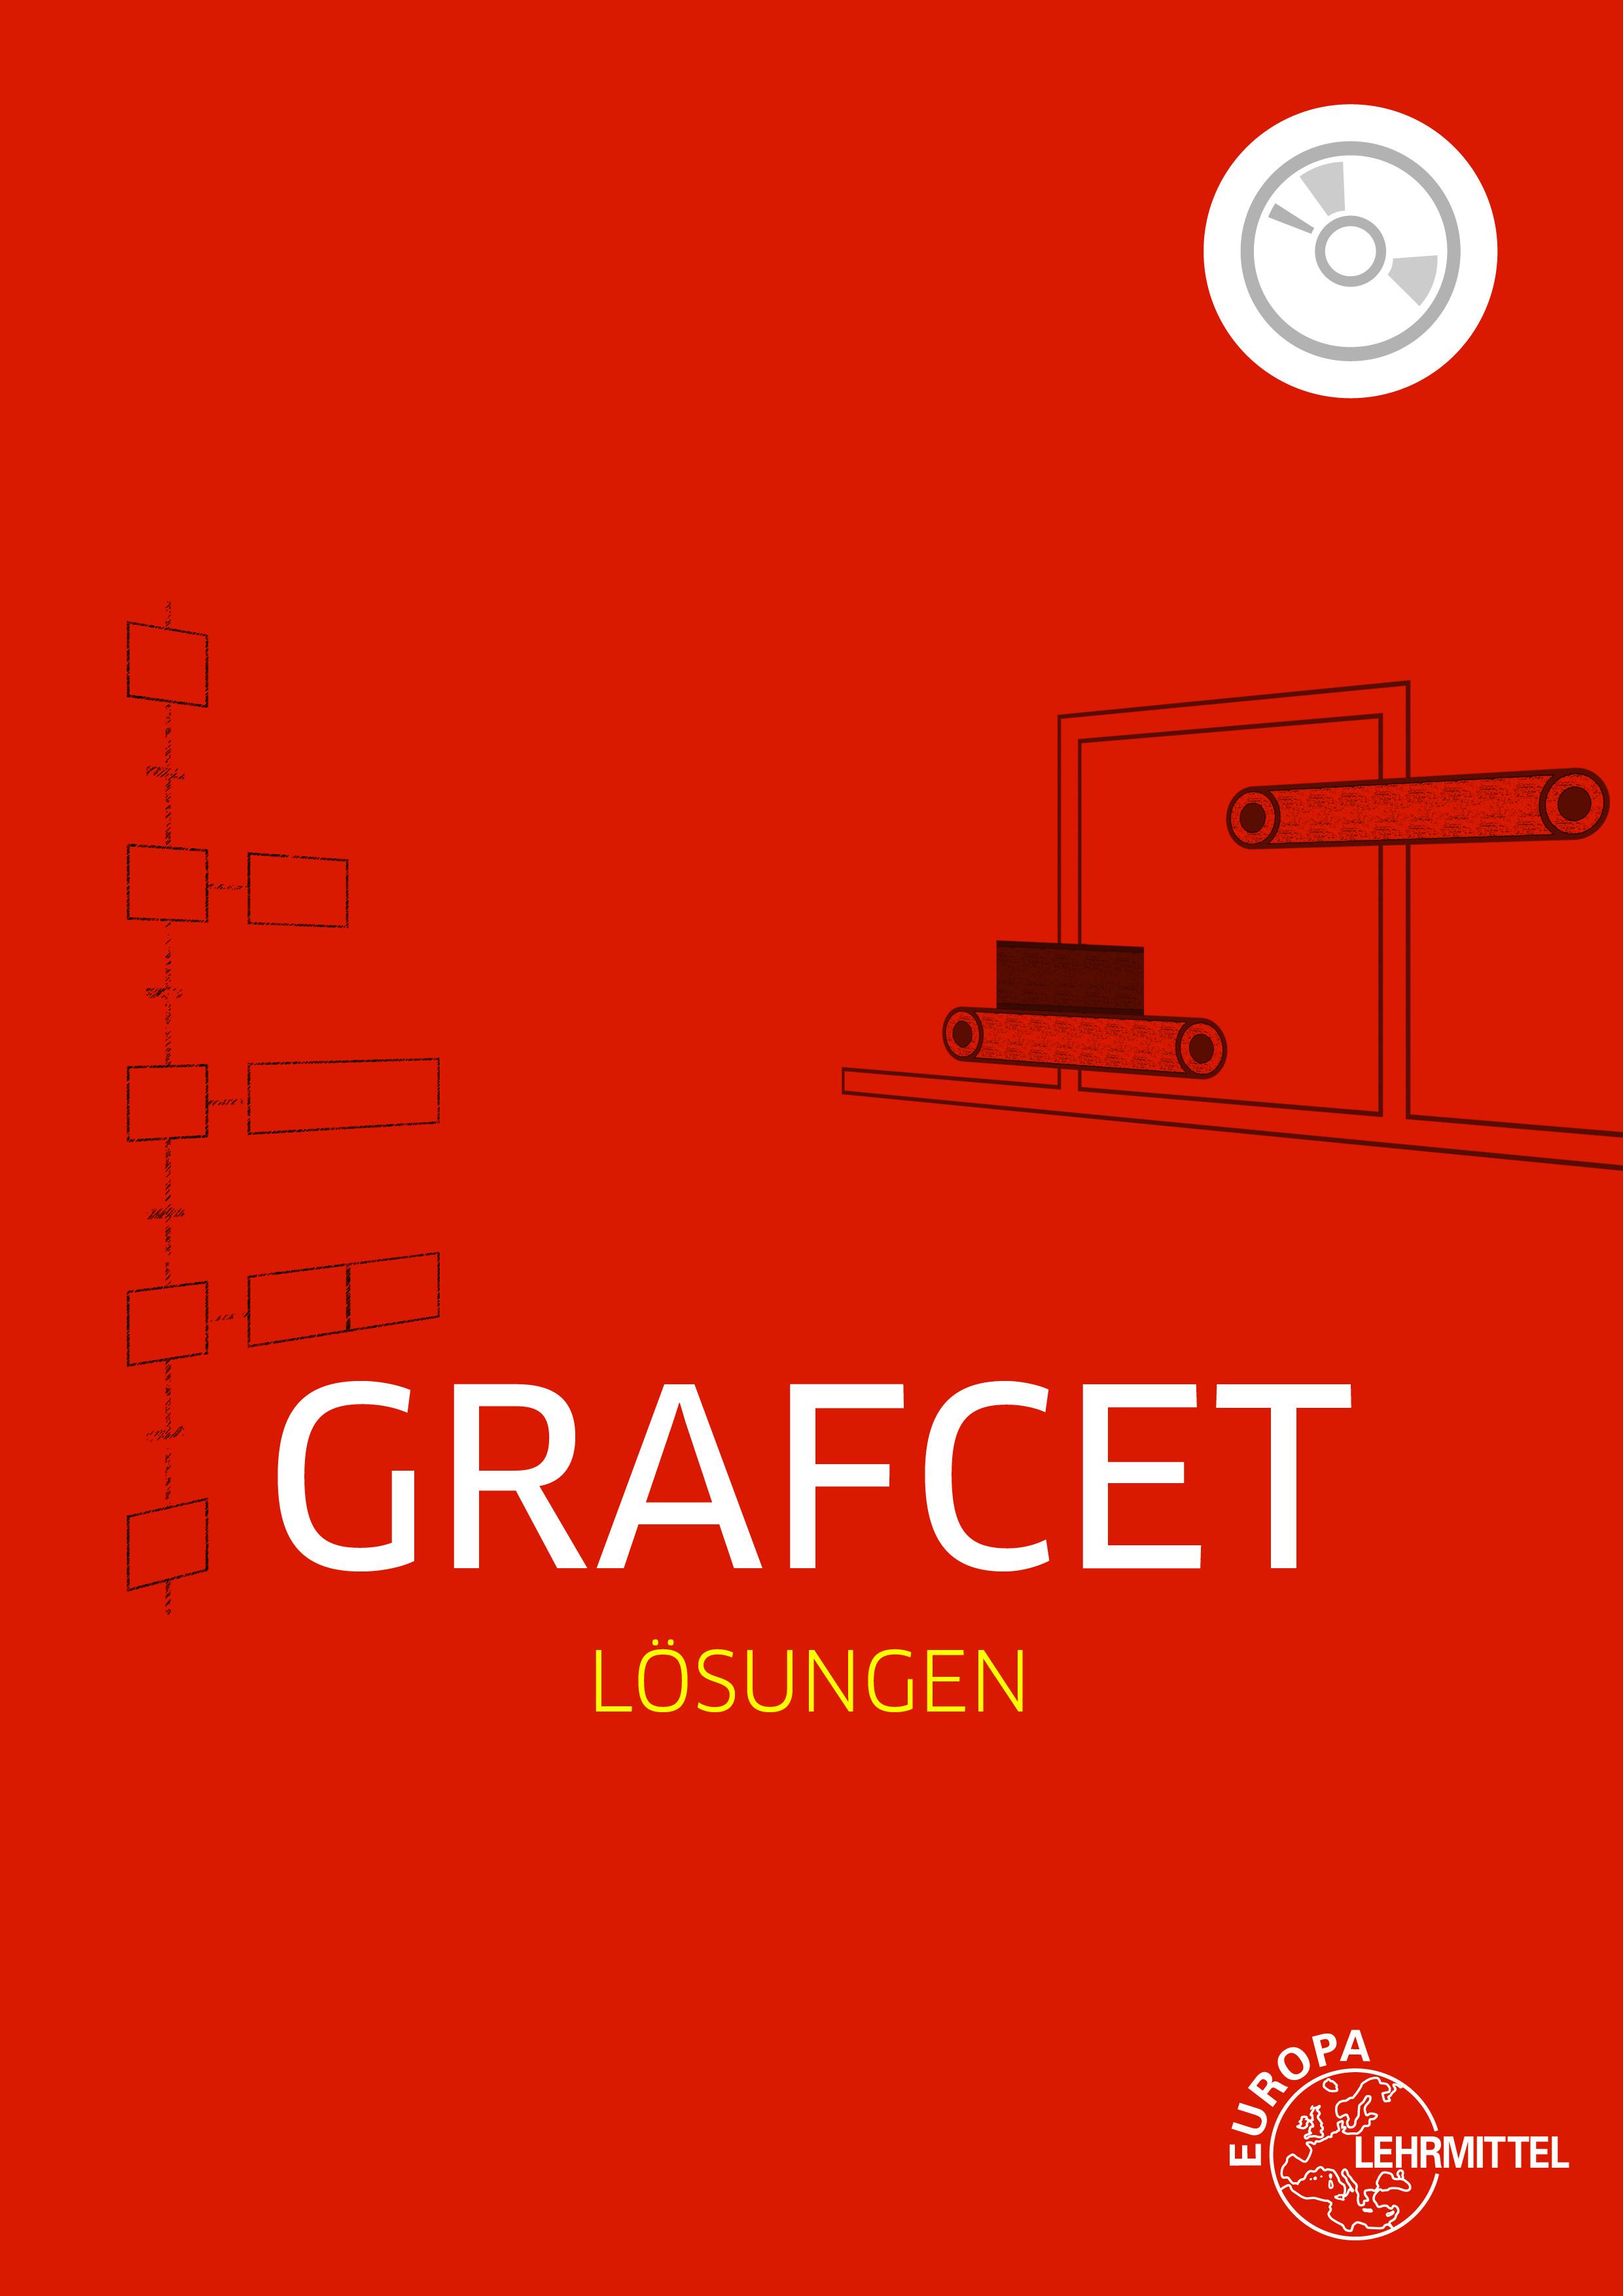 GRAFCET - Das Buch